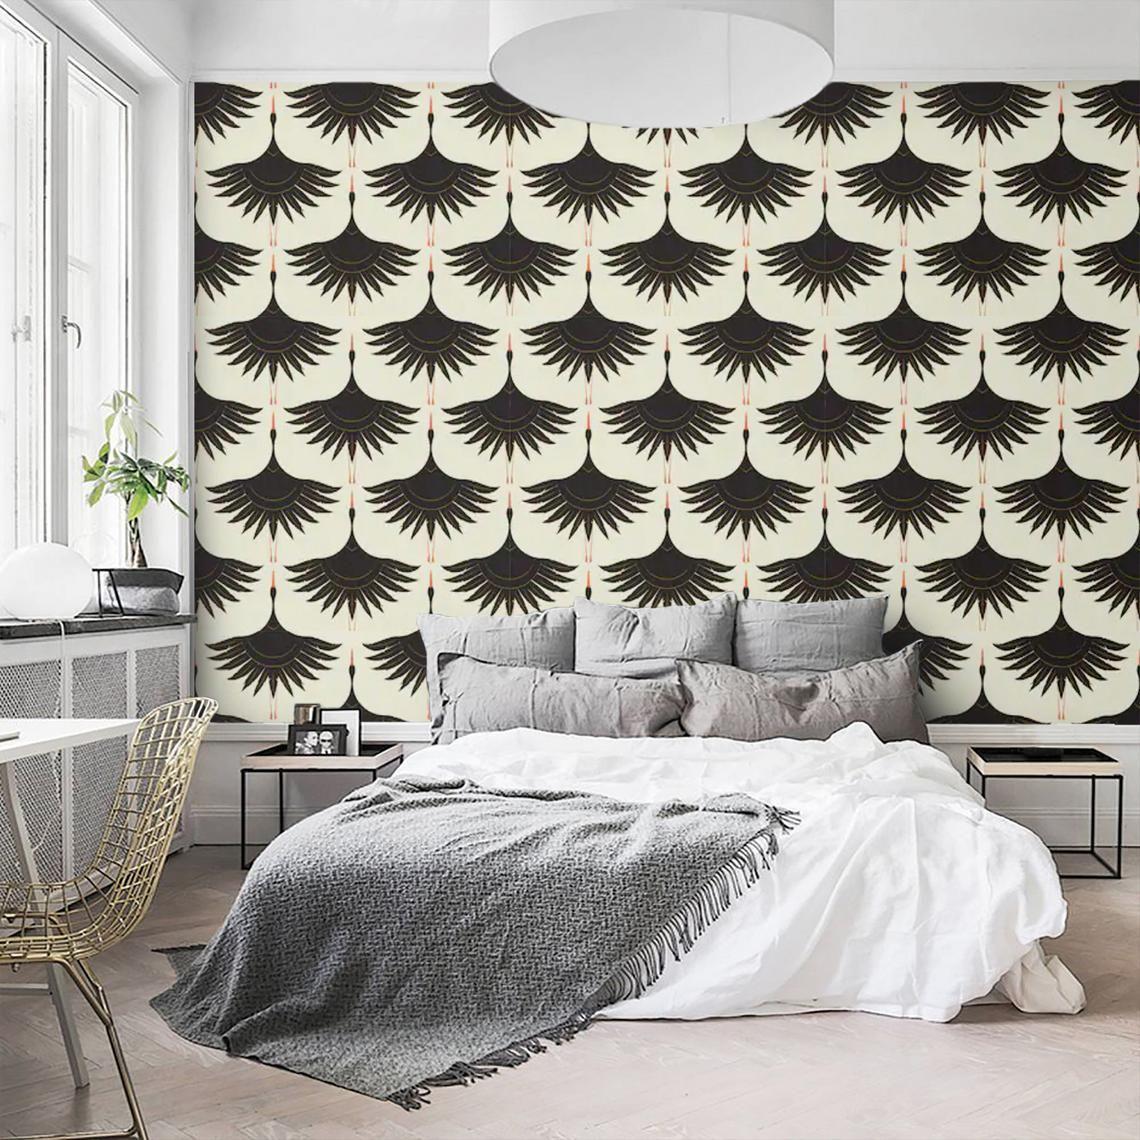 Wallpaper Crane Birds Peel And Stick Wallpaper Mural Art Deco Etsy Peel And Stick Wallpaper Mural Wallpaper Accent Wall